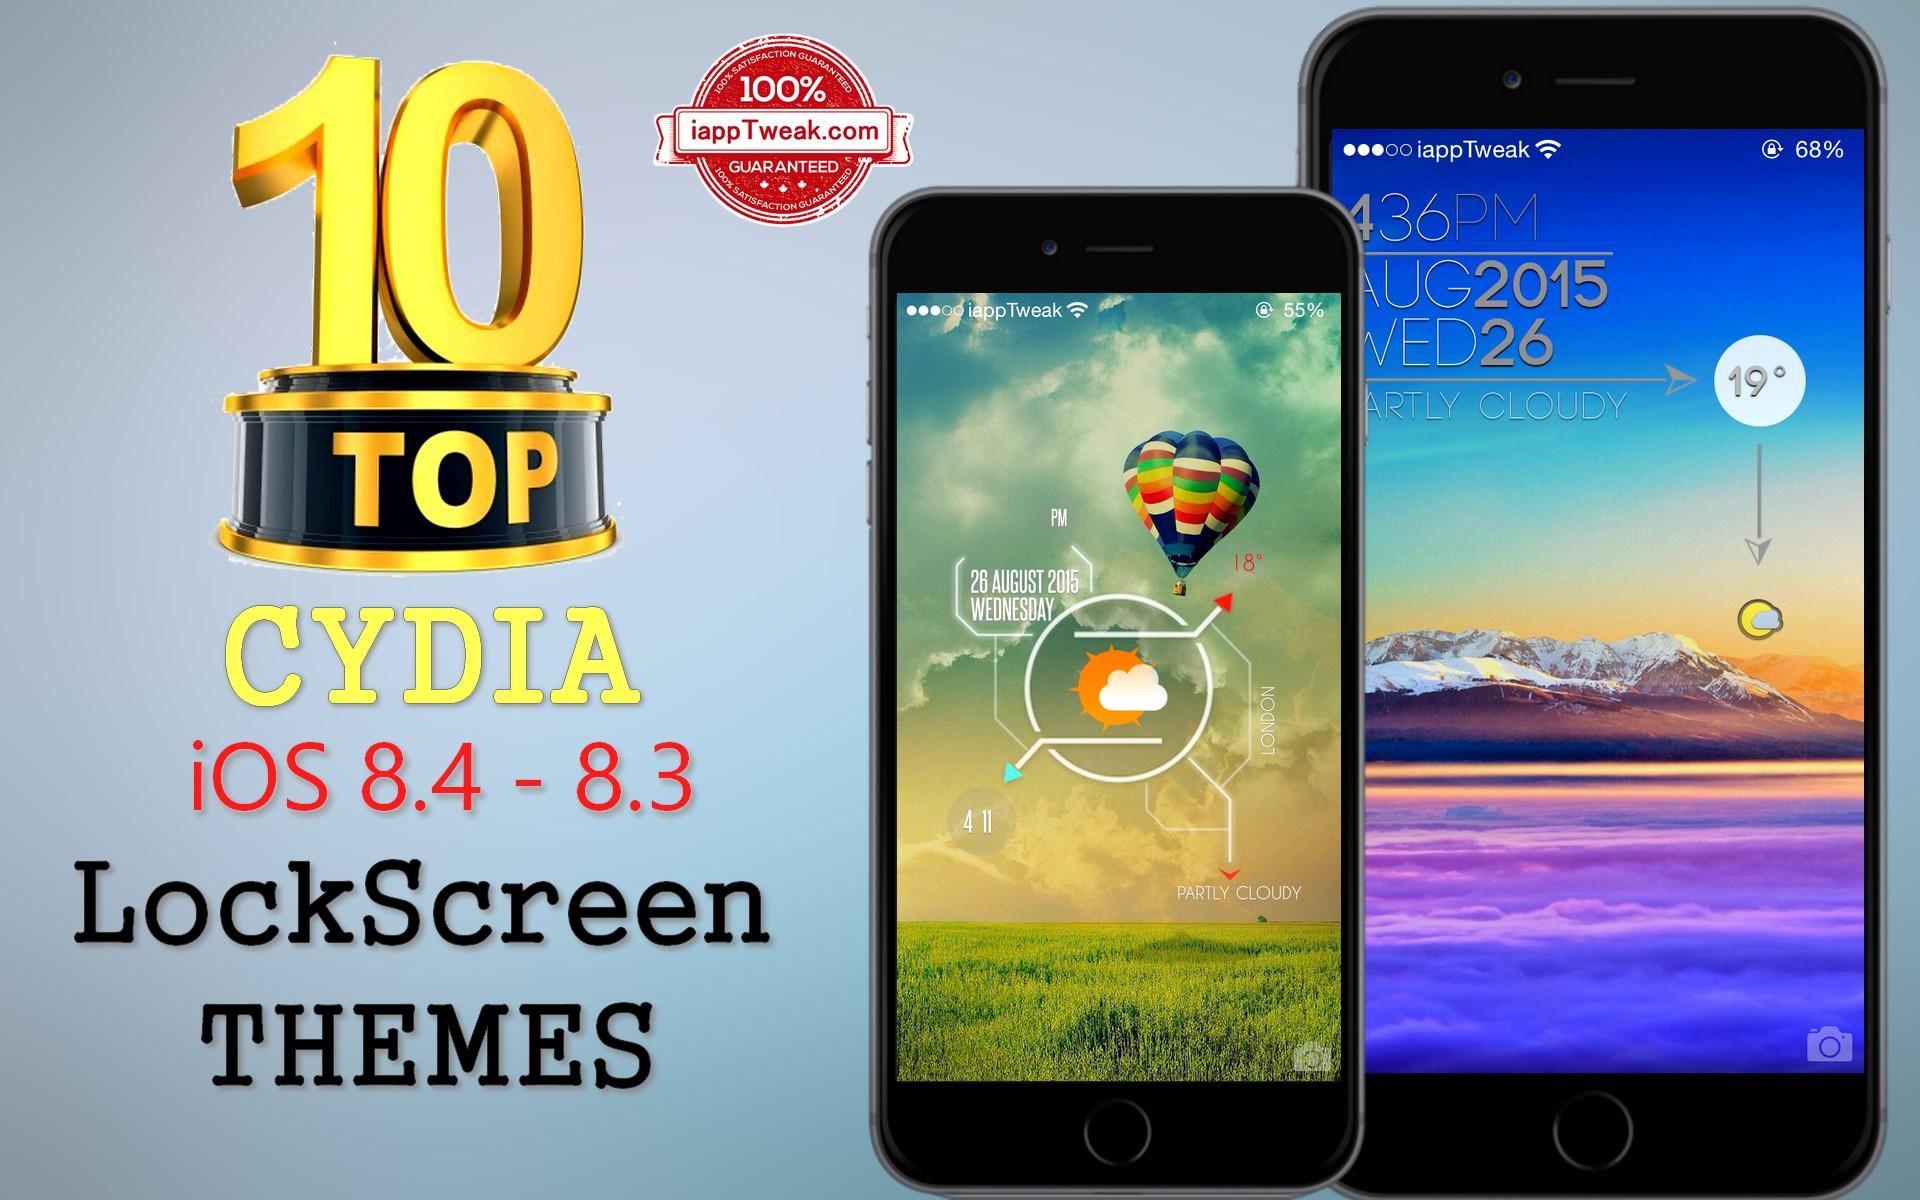 top 10 cydia lockscreen themes for ios 8 4 ios 8 3 8 7 part 02. Black Bedroom Furniture Sets. Home Design Ideas